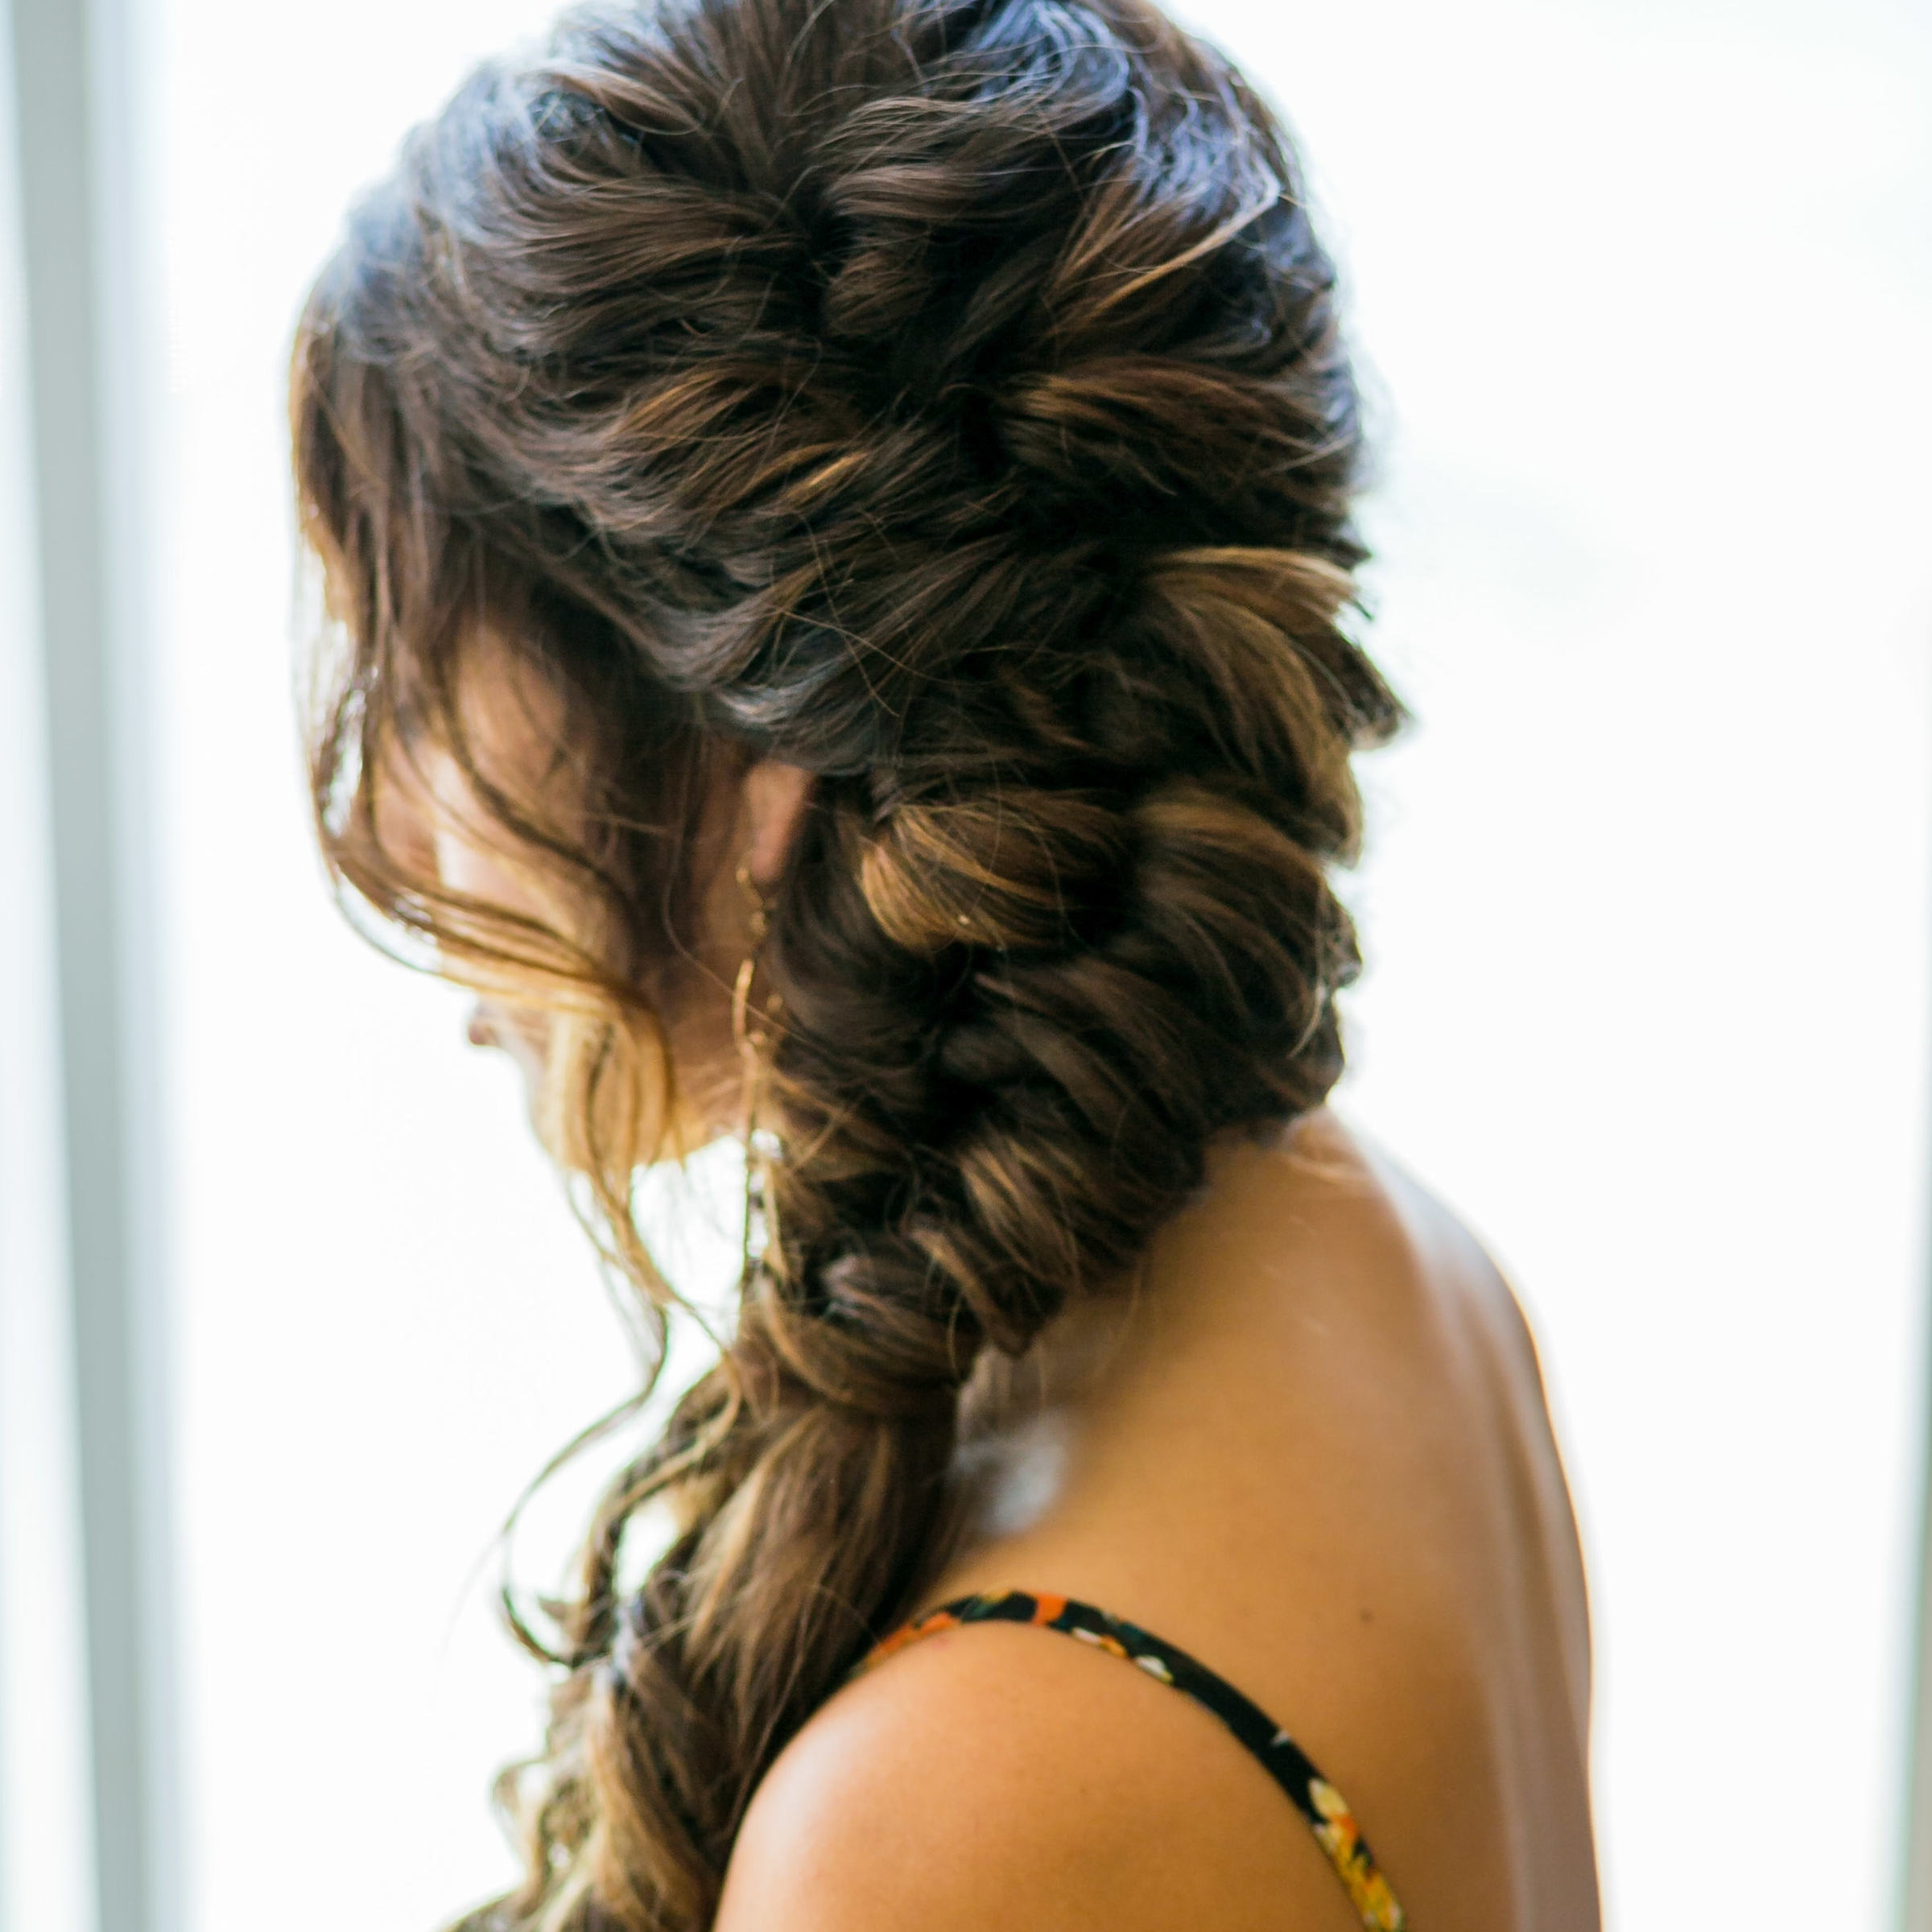 Orange county bridal hair stylist   Braided hair style ideas